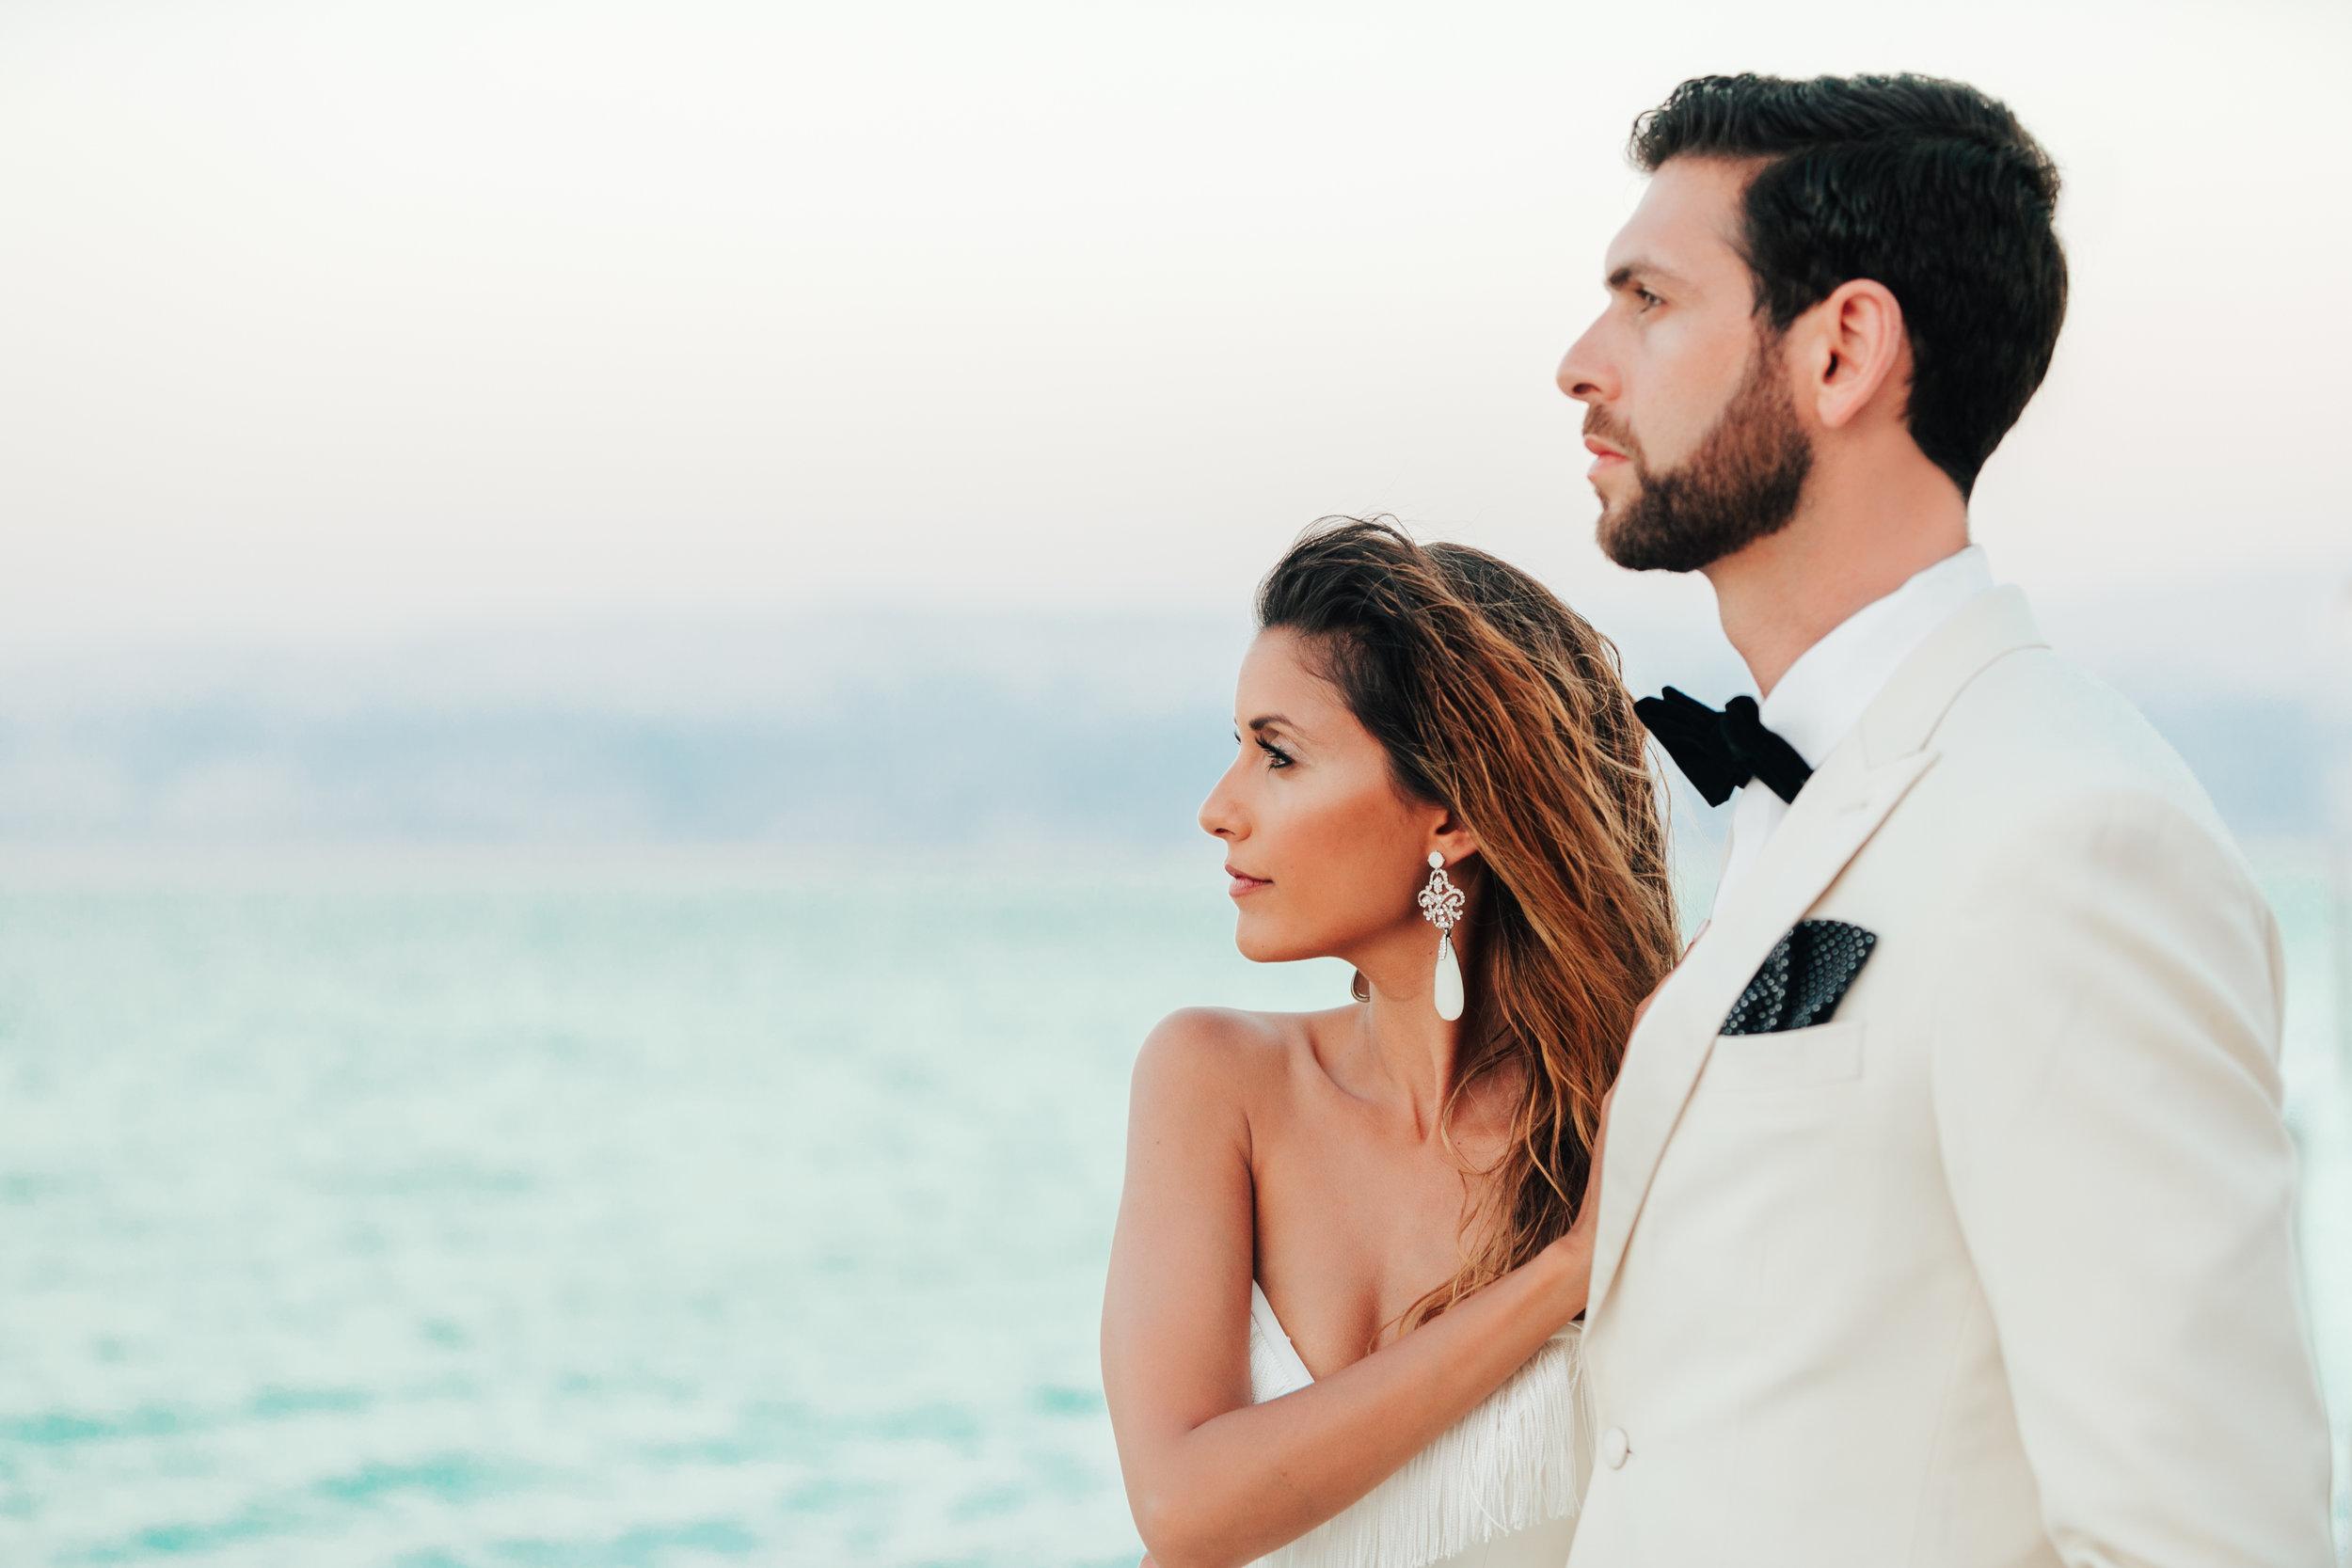 Anée Atelier Israel Nathalie Karynina Bride 15